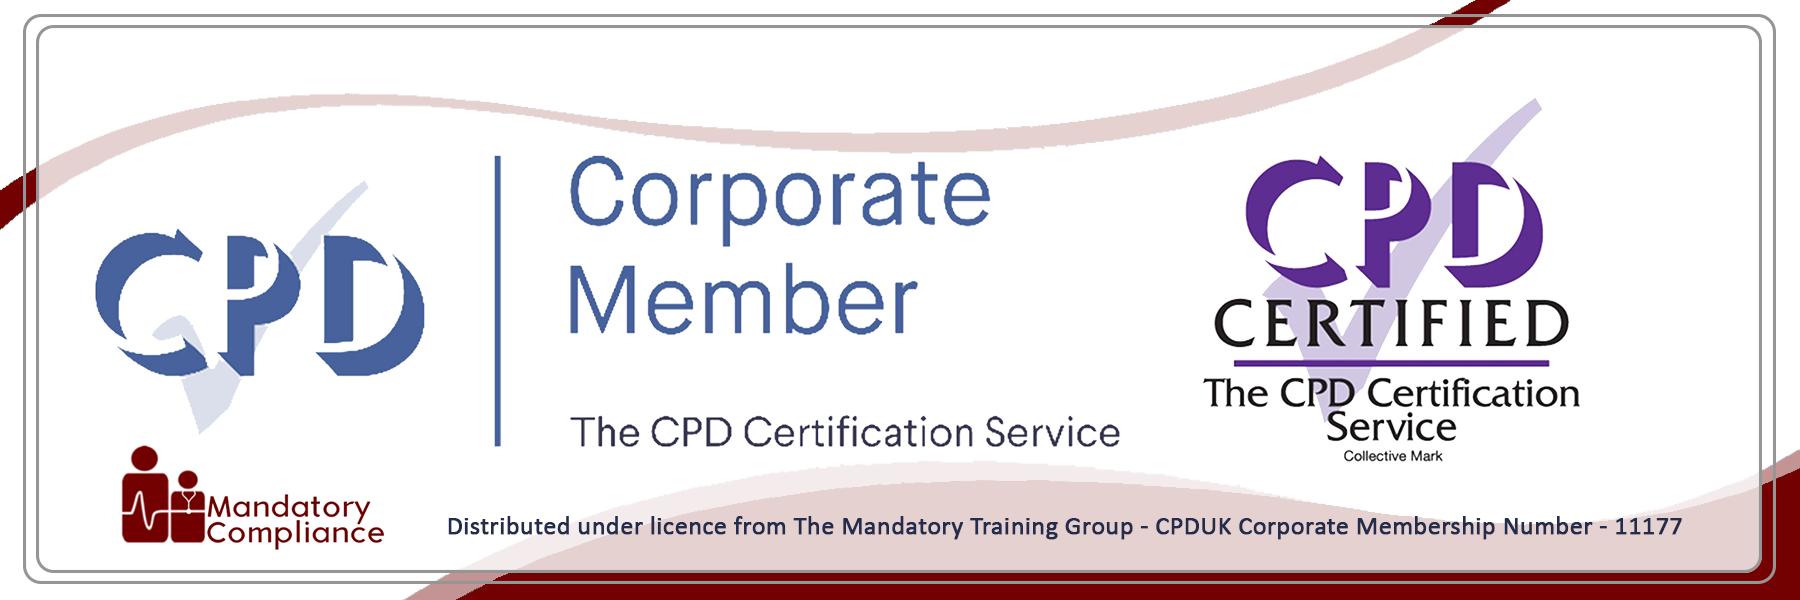 Diabetes Awareness - Online Learning Courses - E-Learning Courses - Mandatory Compliance UK---